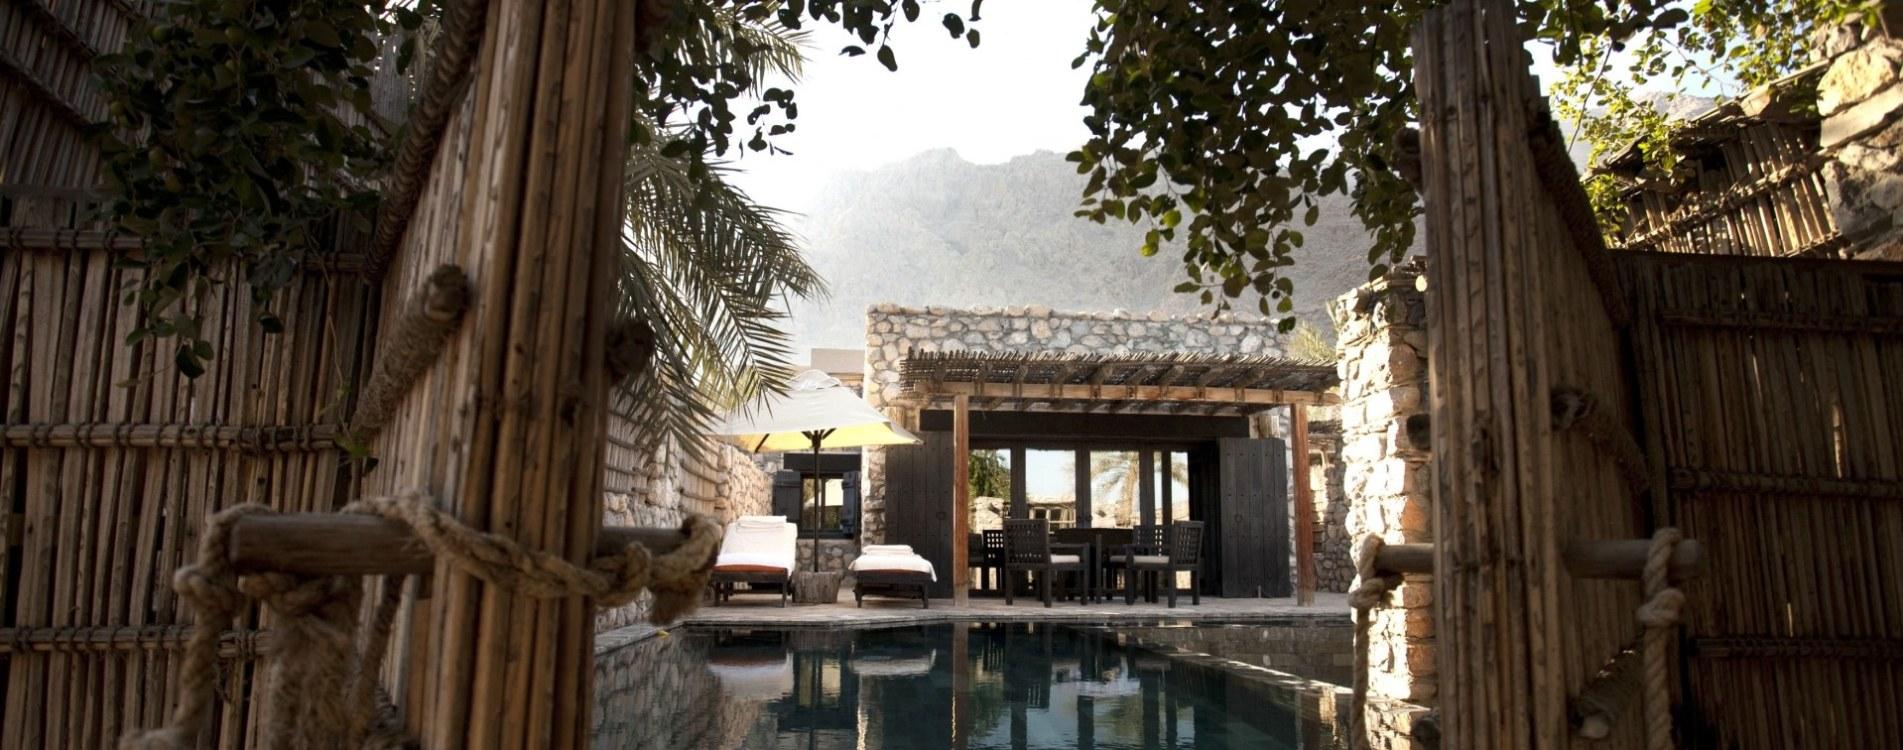 Six-Senses-Zighy-Bay-Pool-Villa-Exterior-Oman.jpg